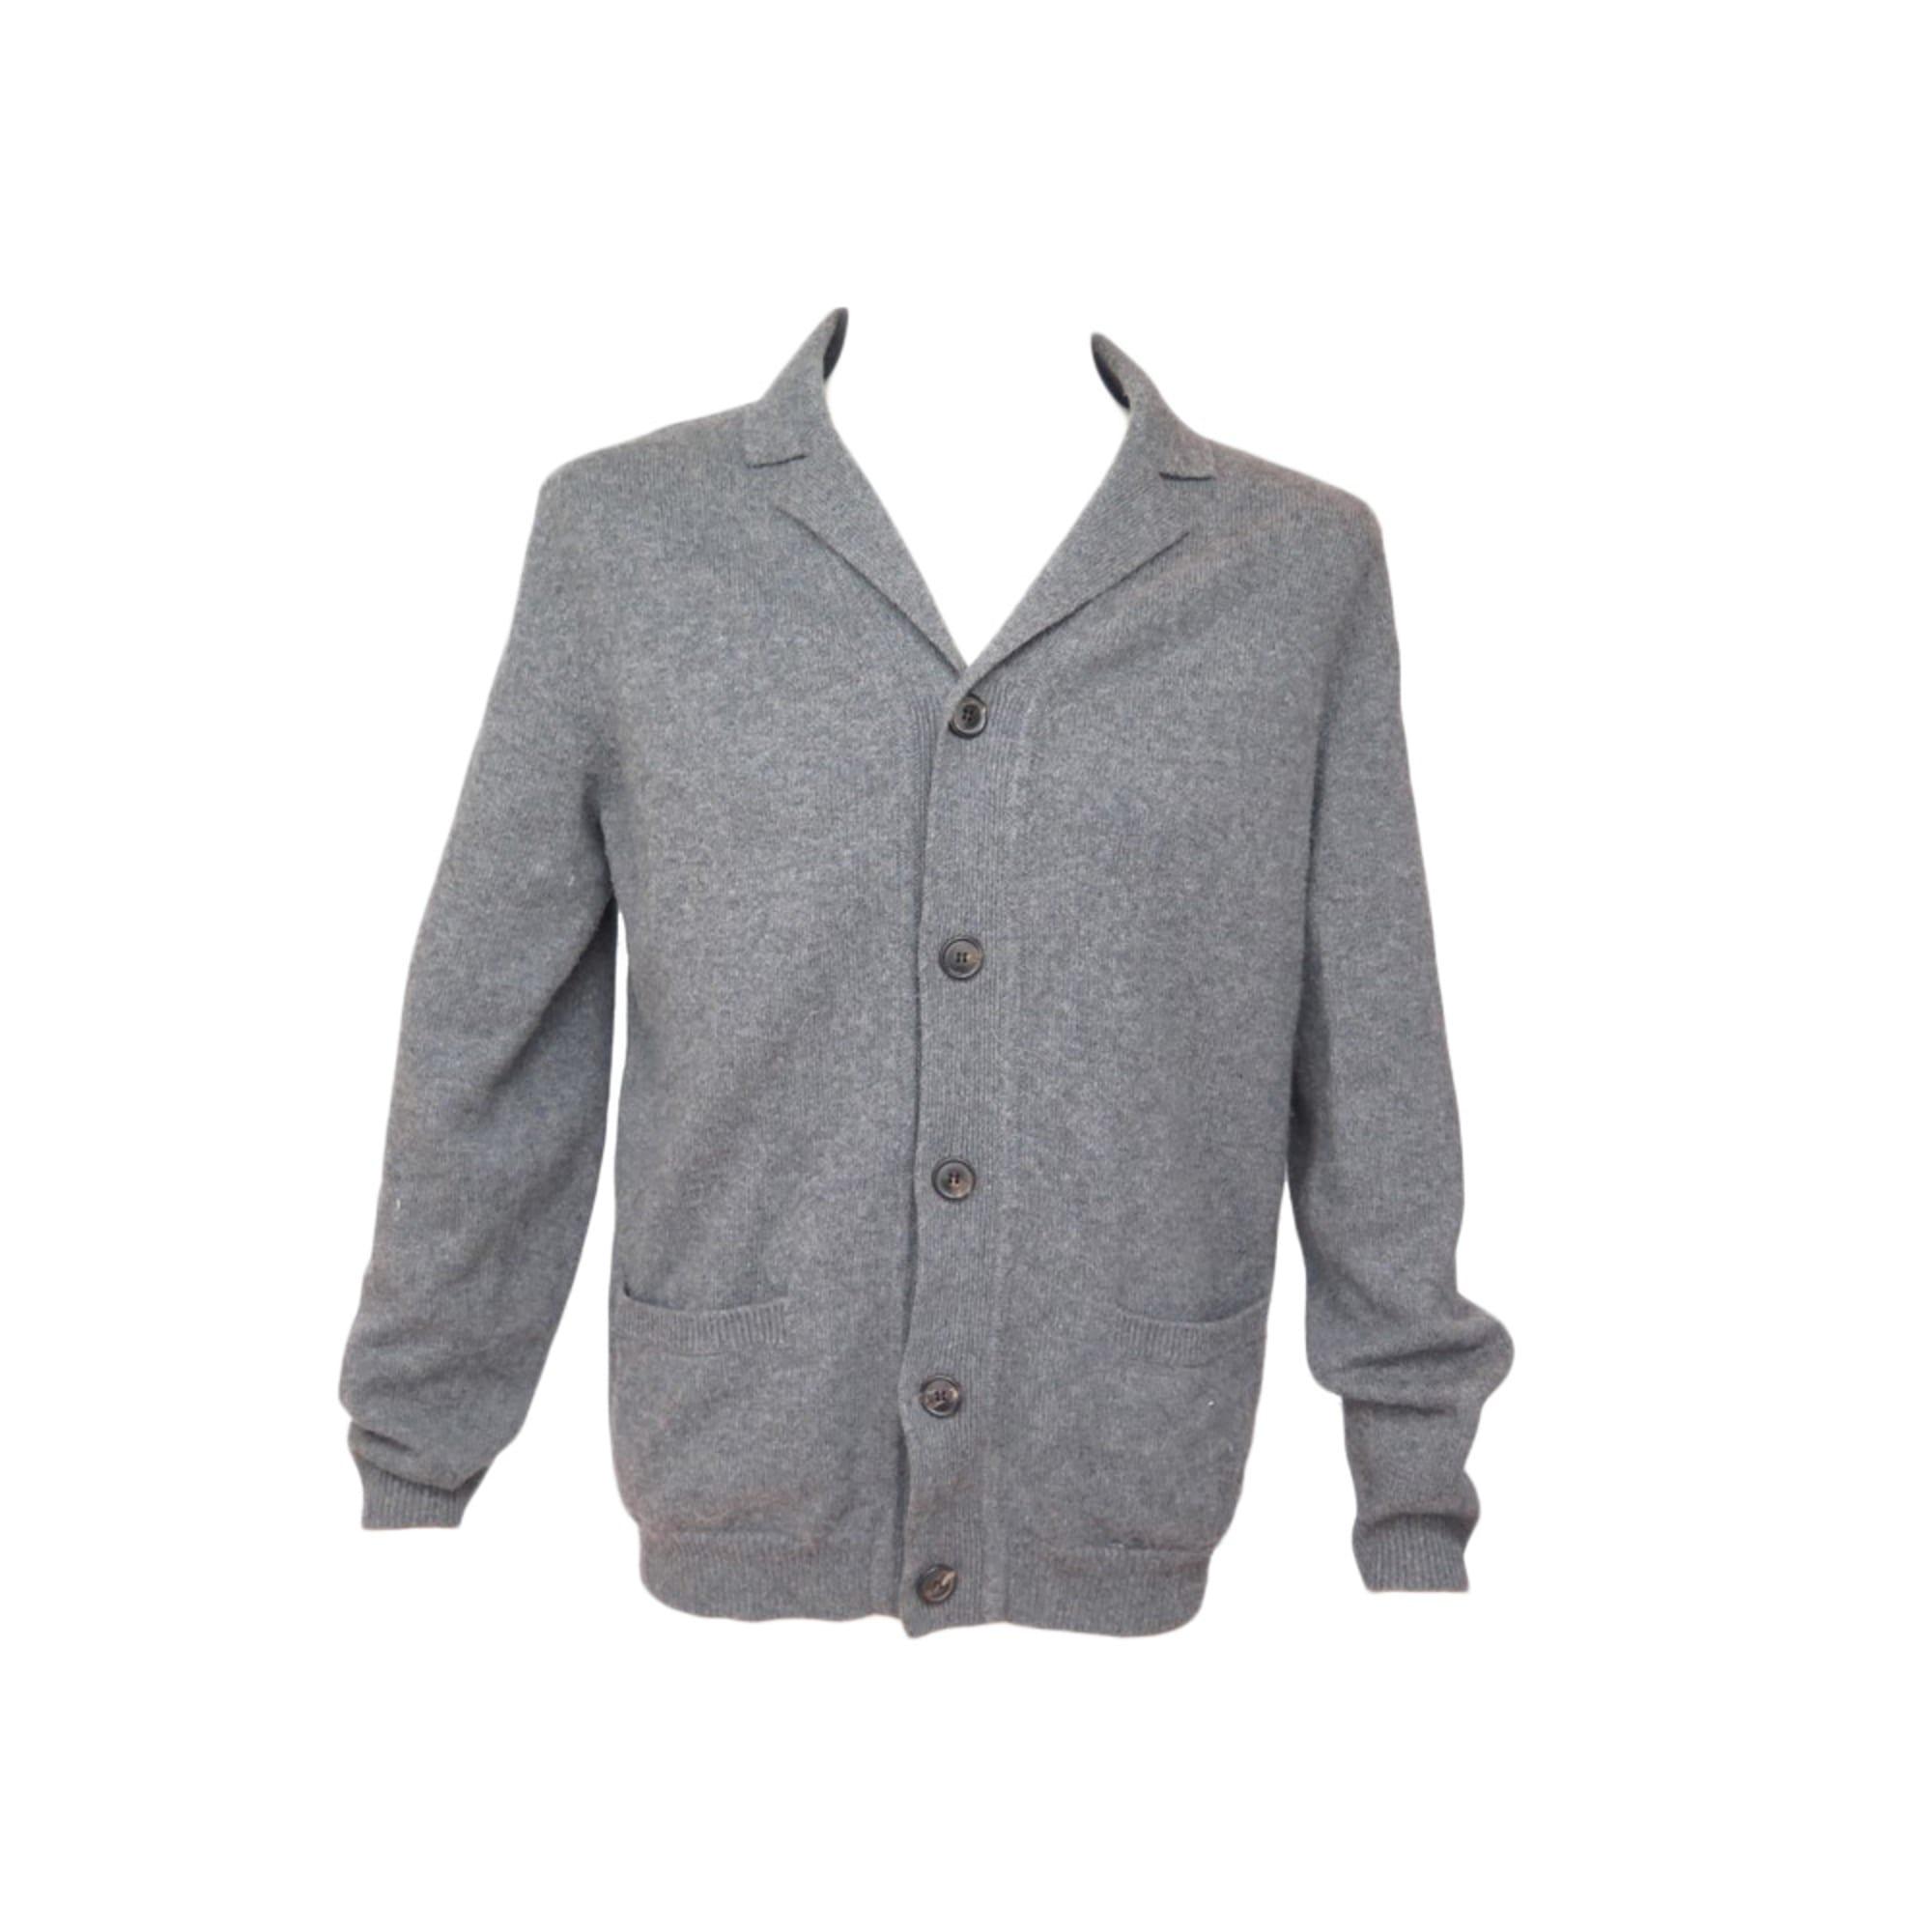 Vest, Cardigan ERIC BOMPARD Gray, charcoal